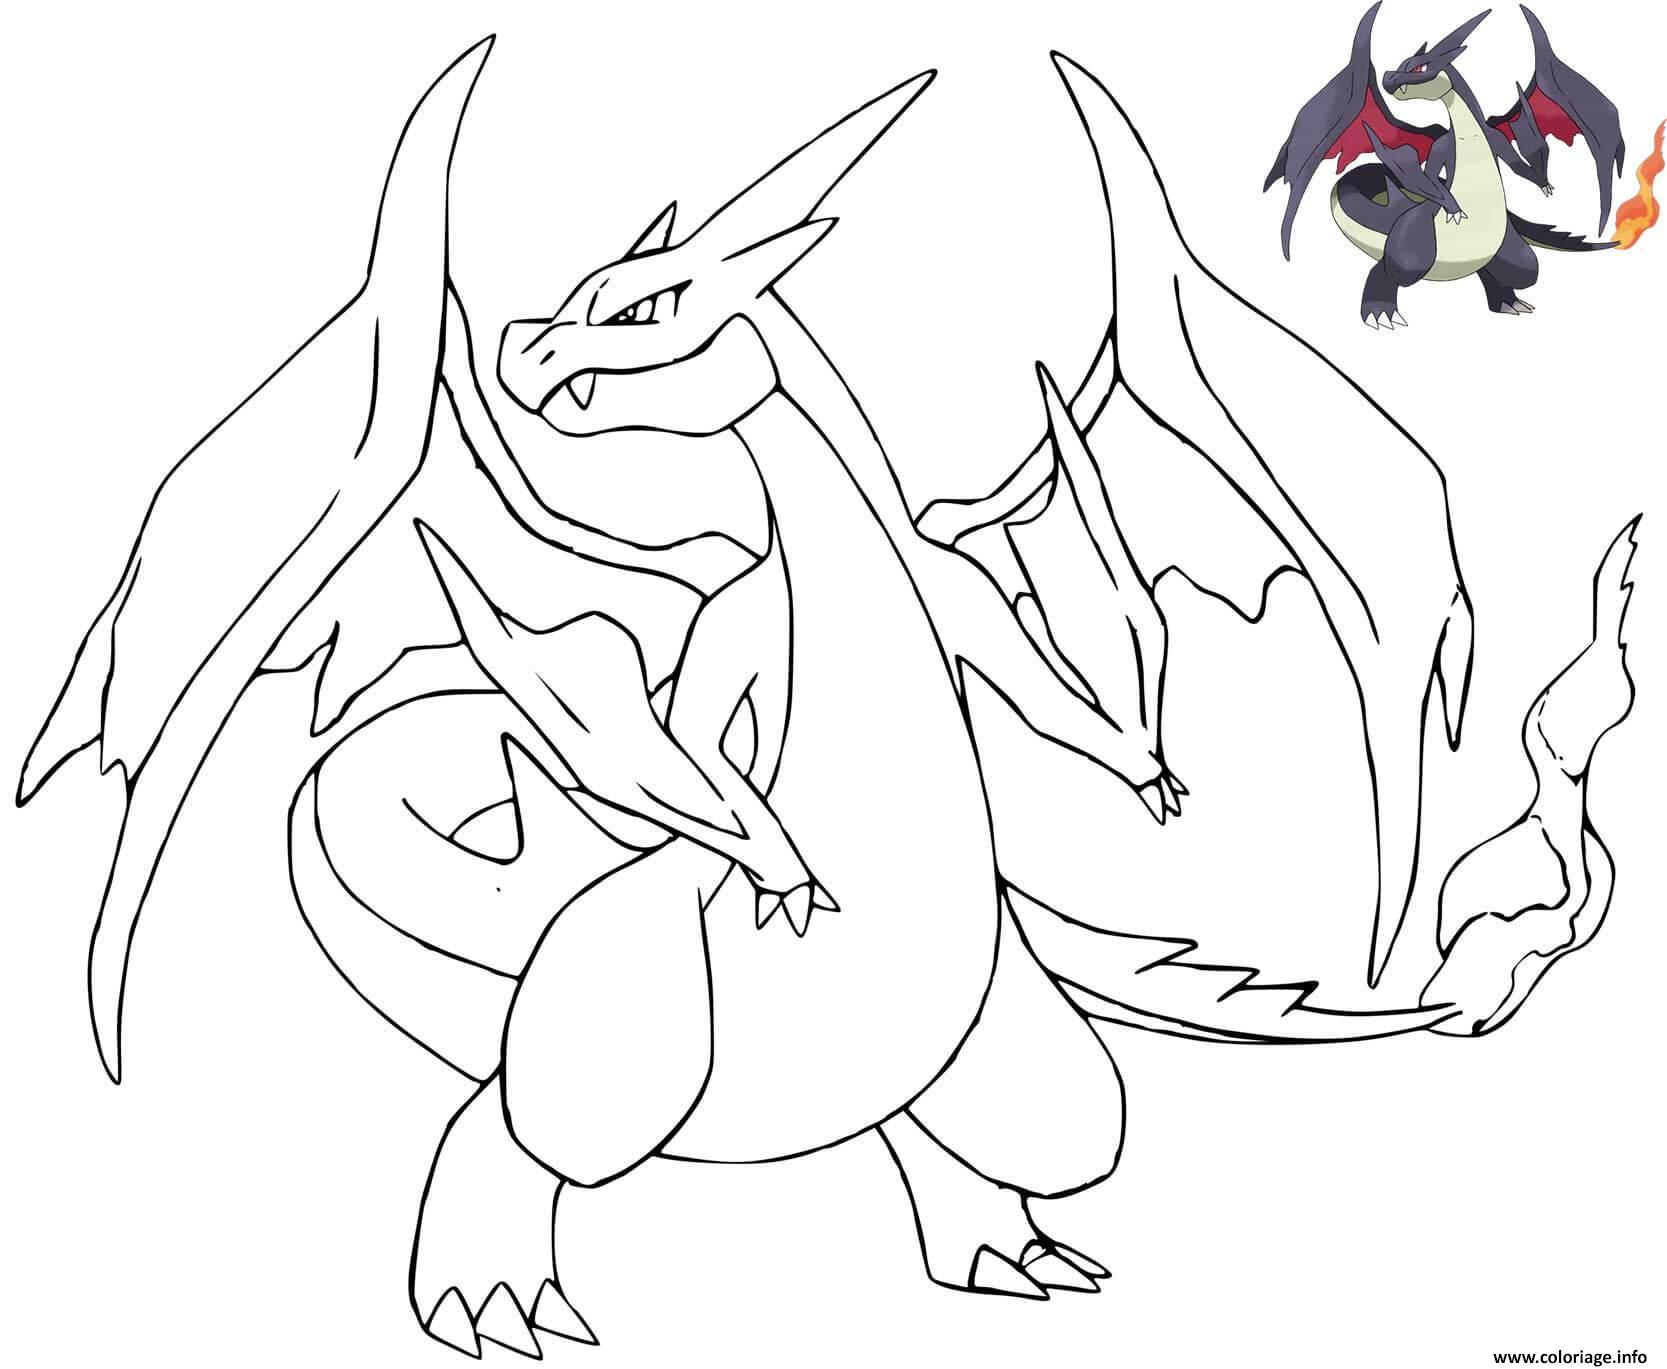 Dessin dracaufeu pokemon mauve avec dessin modele Coloriage Gratuit à Imprimer